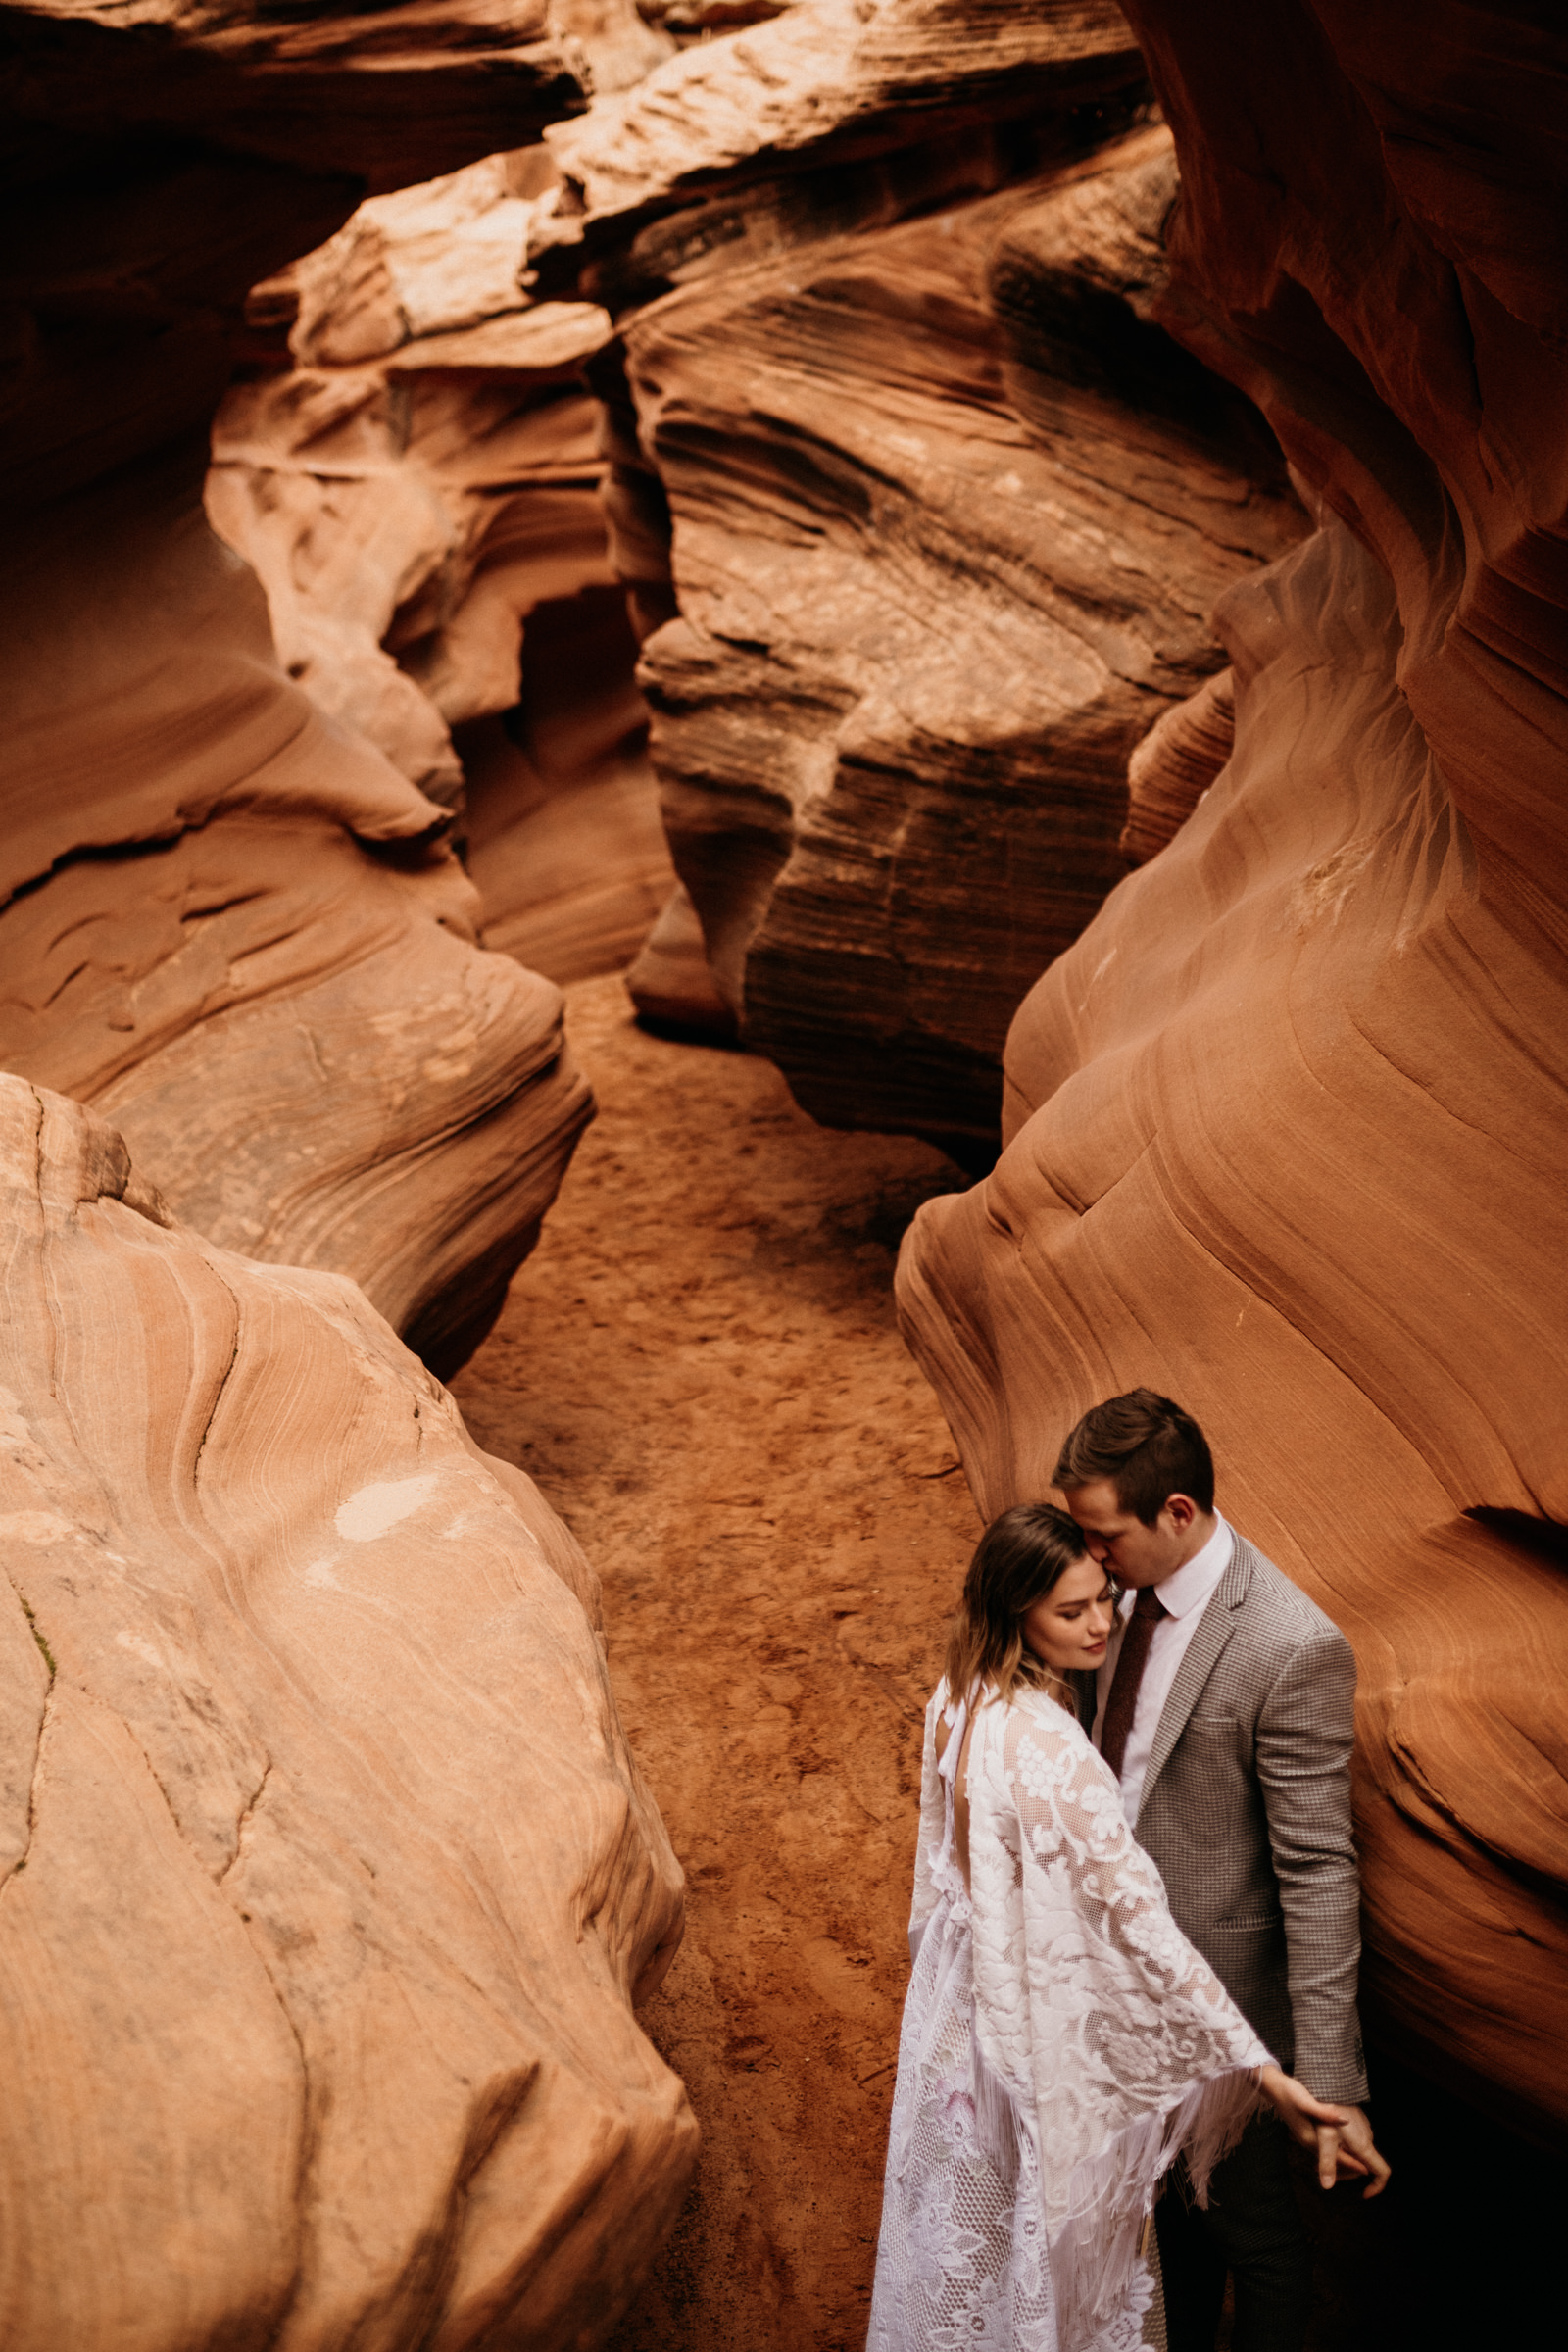 az-adventure-elopement-photographer-in-slot-canyon.jpg